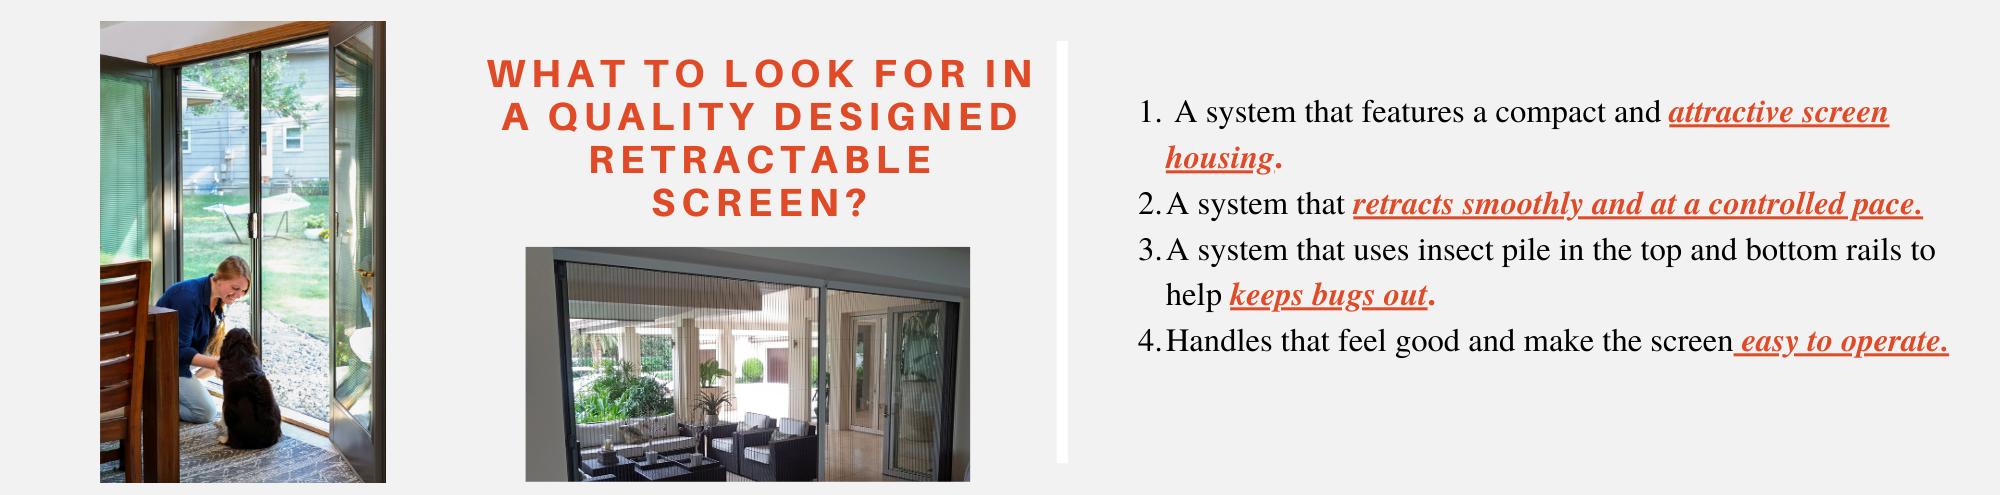 Quality Designed Retractable Screens